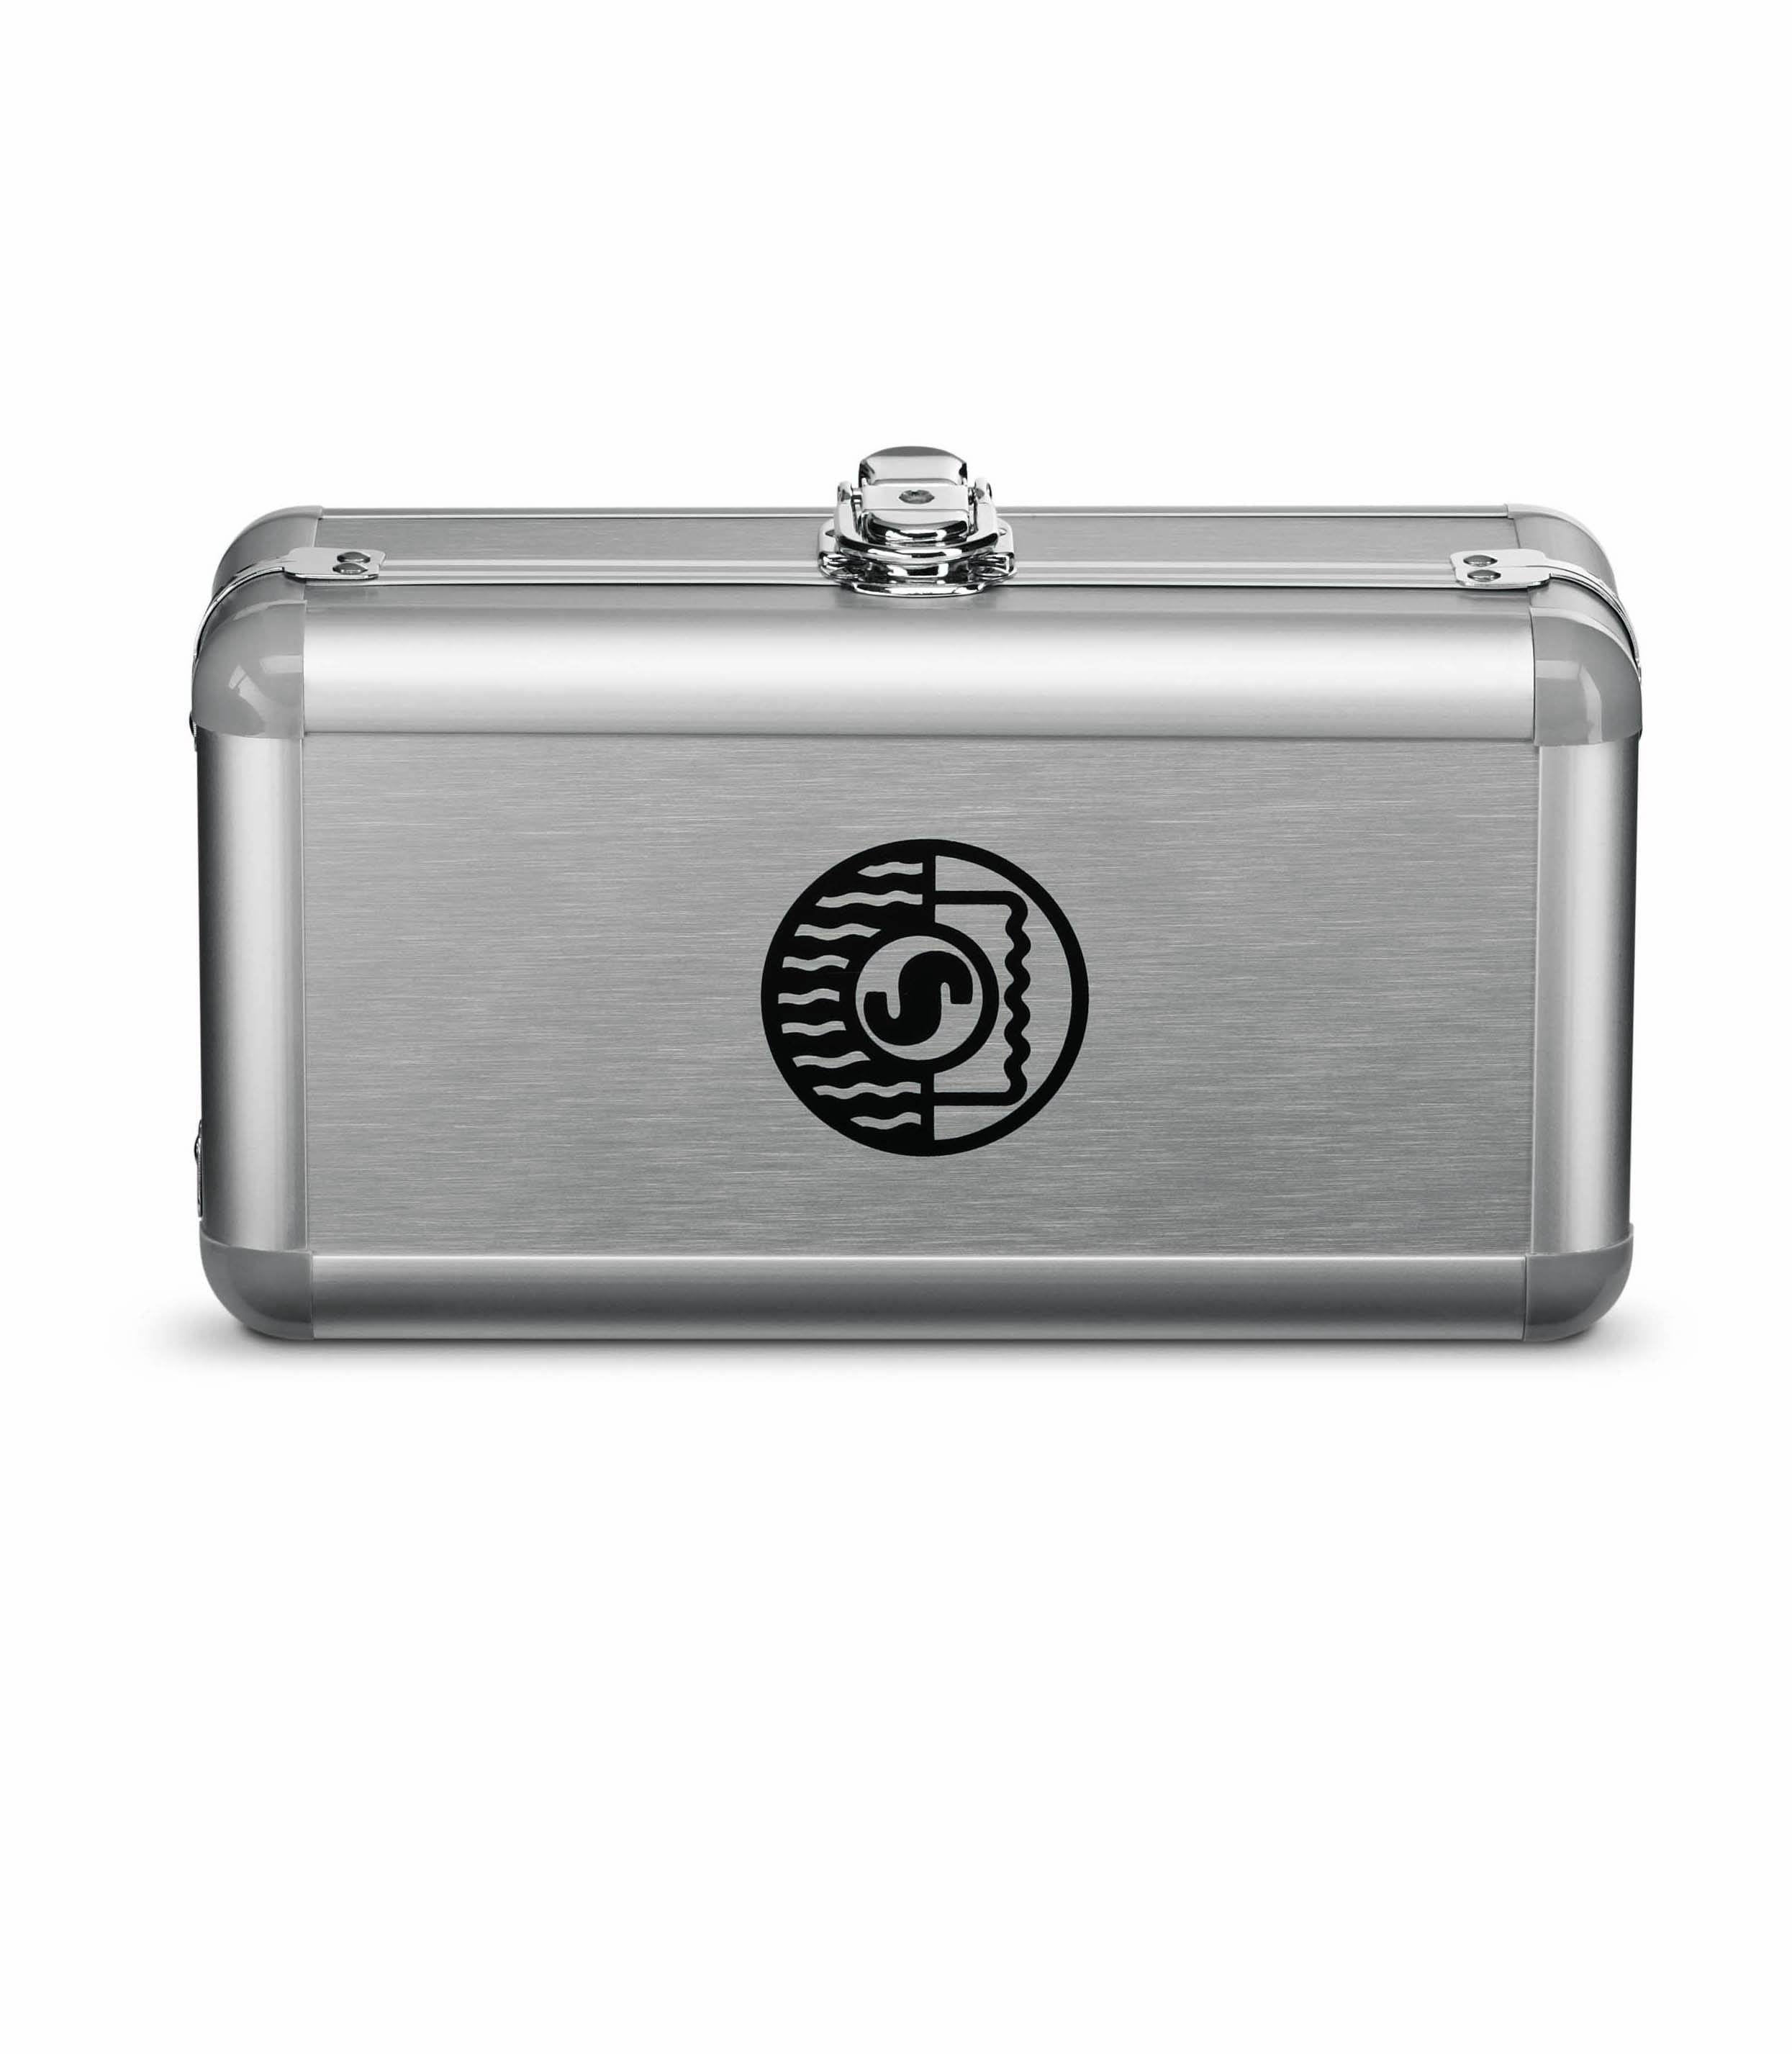 KSM9 CG - Buy Online